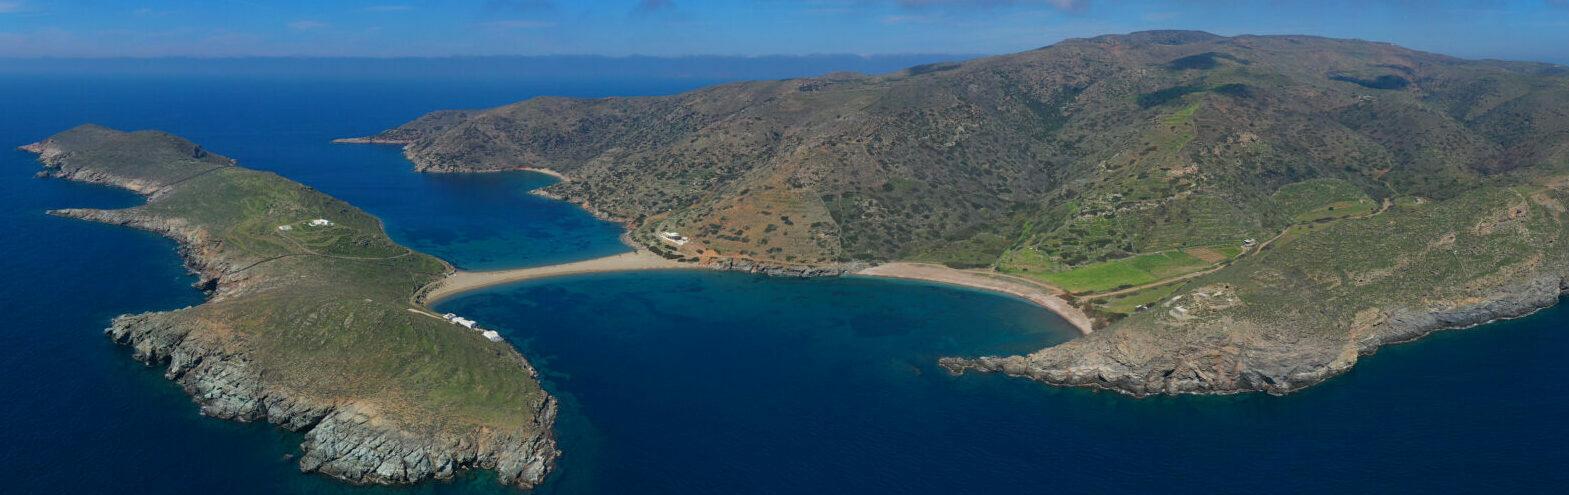 Kythnos: 92 beaches in one island